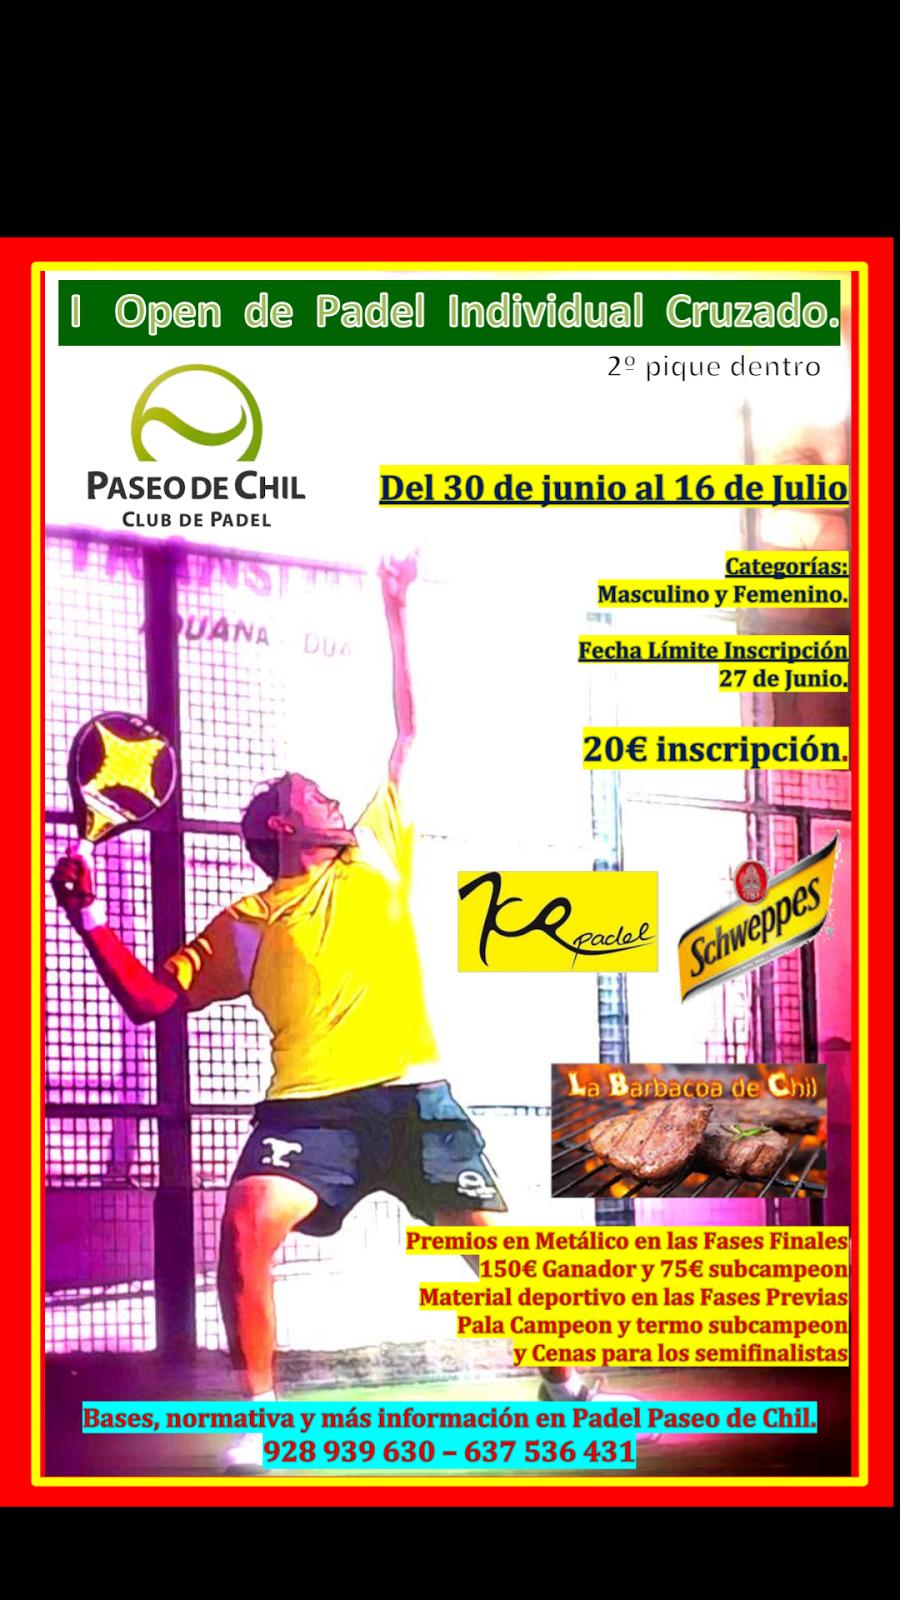 a9f88a232 Padel Paseo de Chil, Las Palmas: E V E N T O S